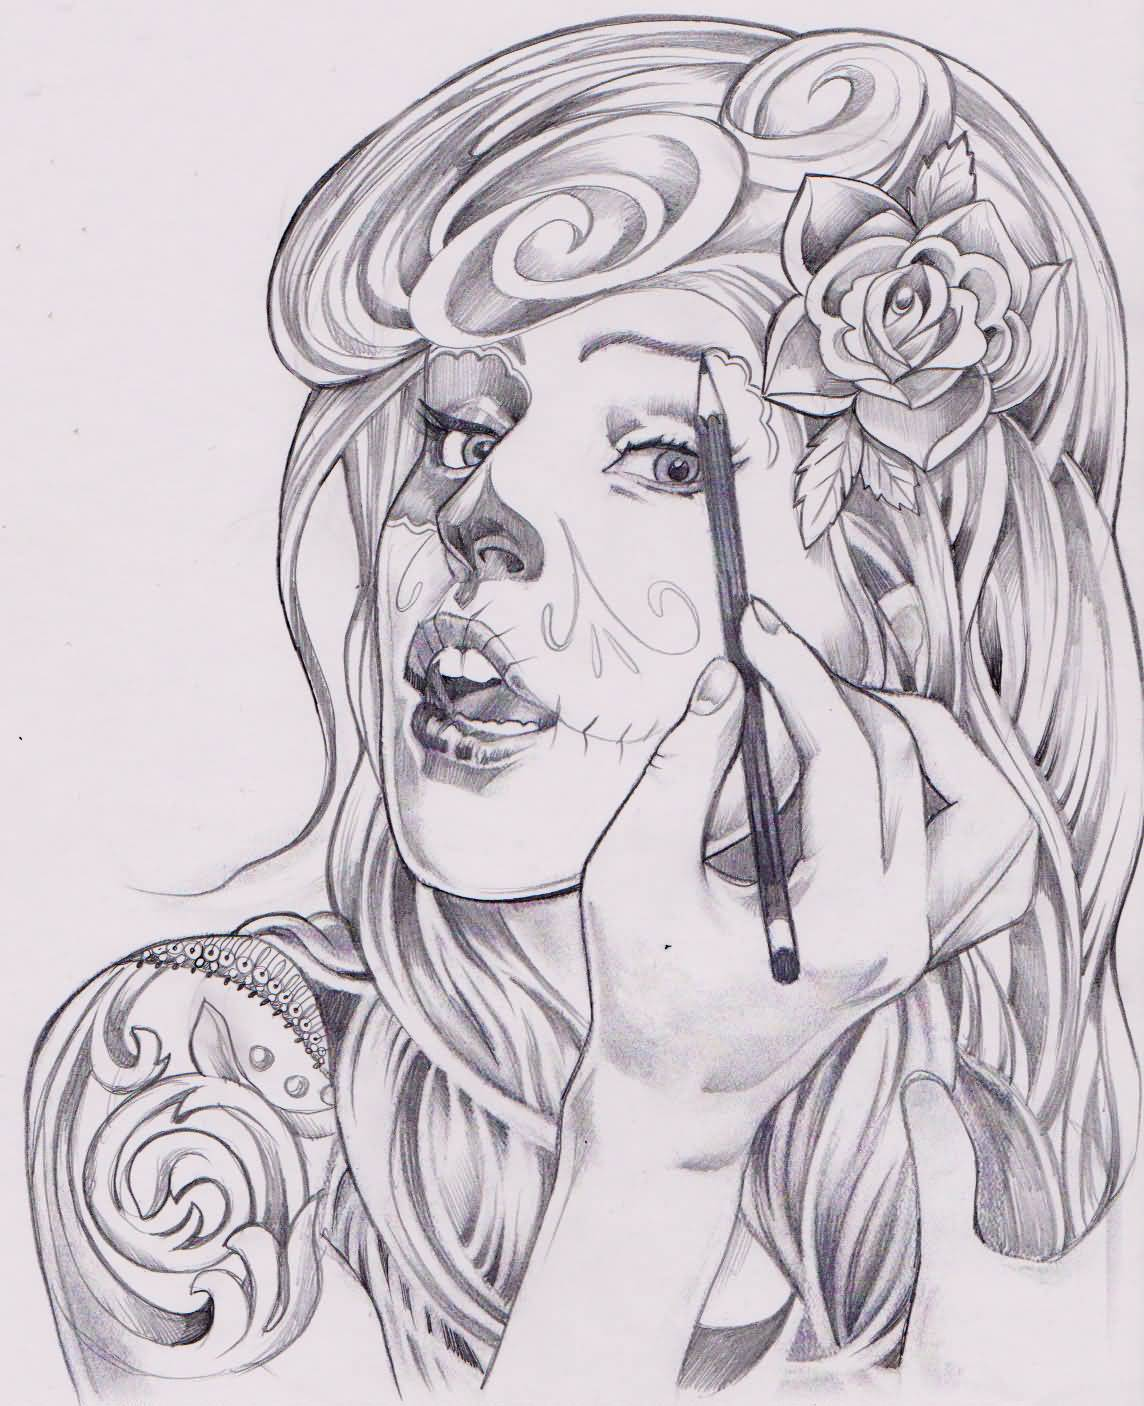 Sketch Tattoo Ideas Pinterest: Cute Catrina Drawing Herself Tattoo Sketch